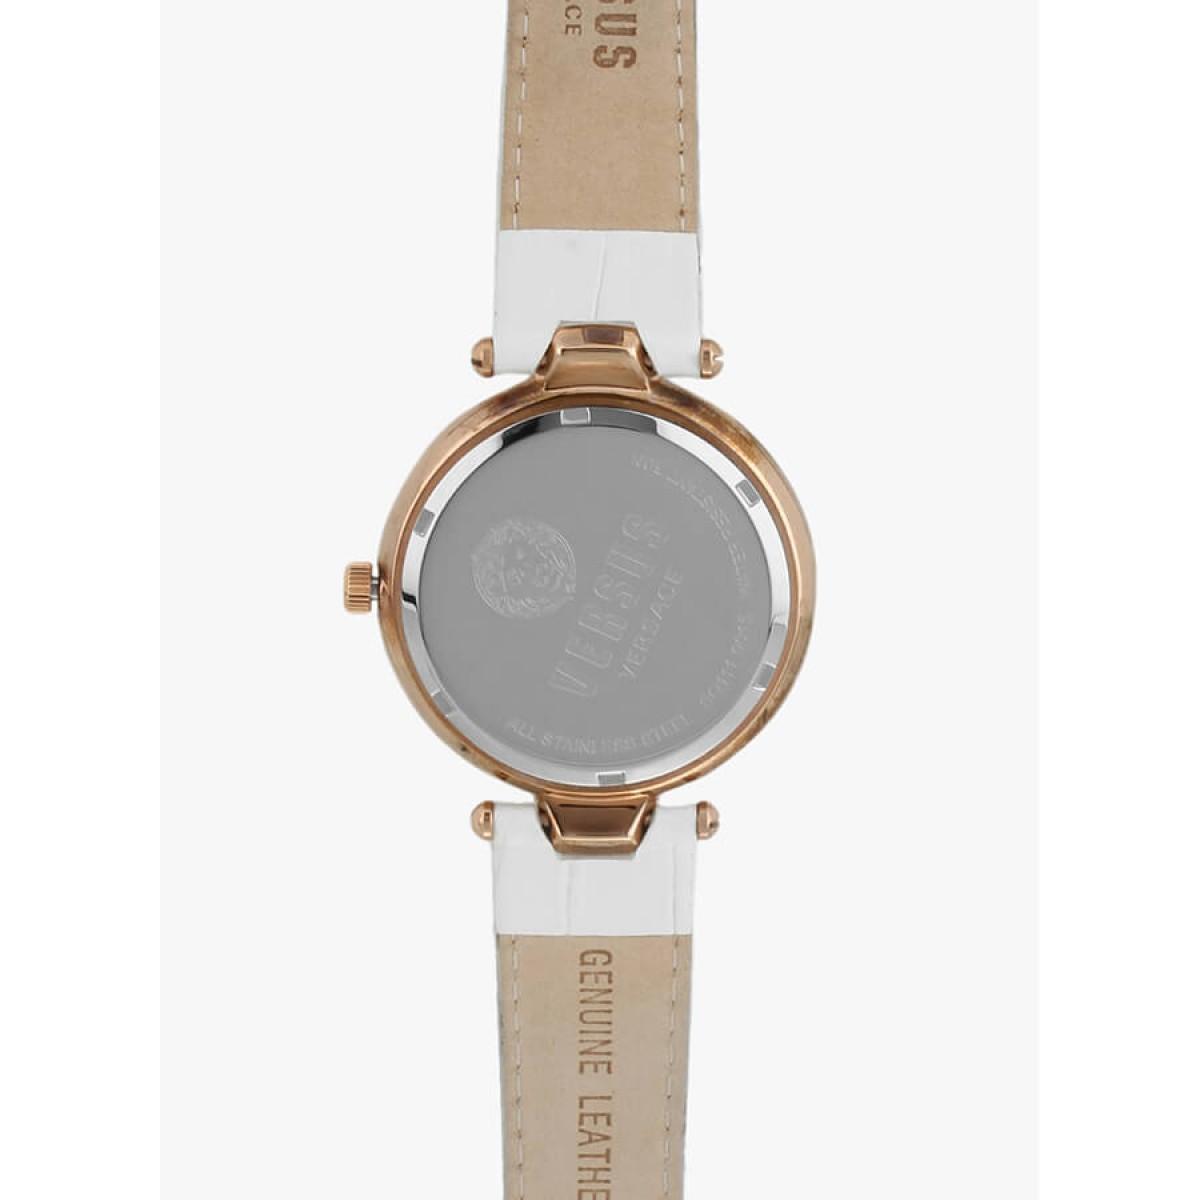 Часовник Versus SQ111 0015